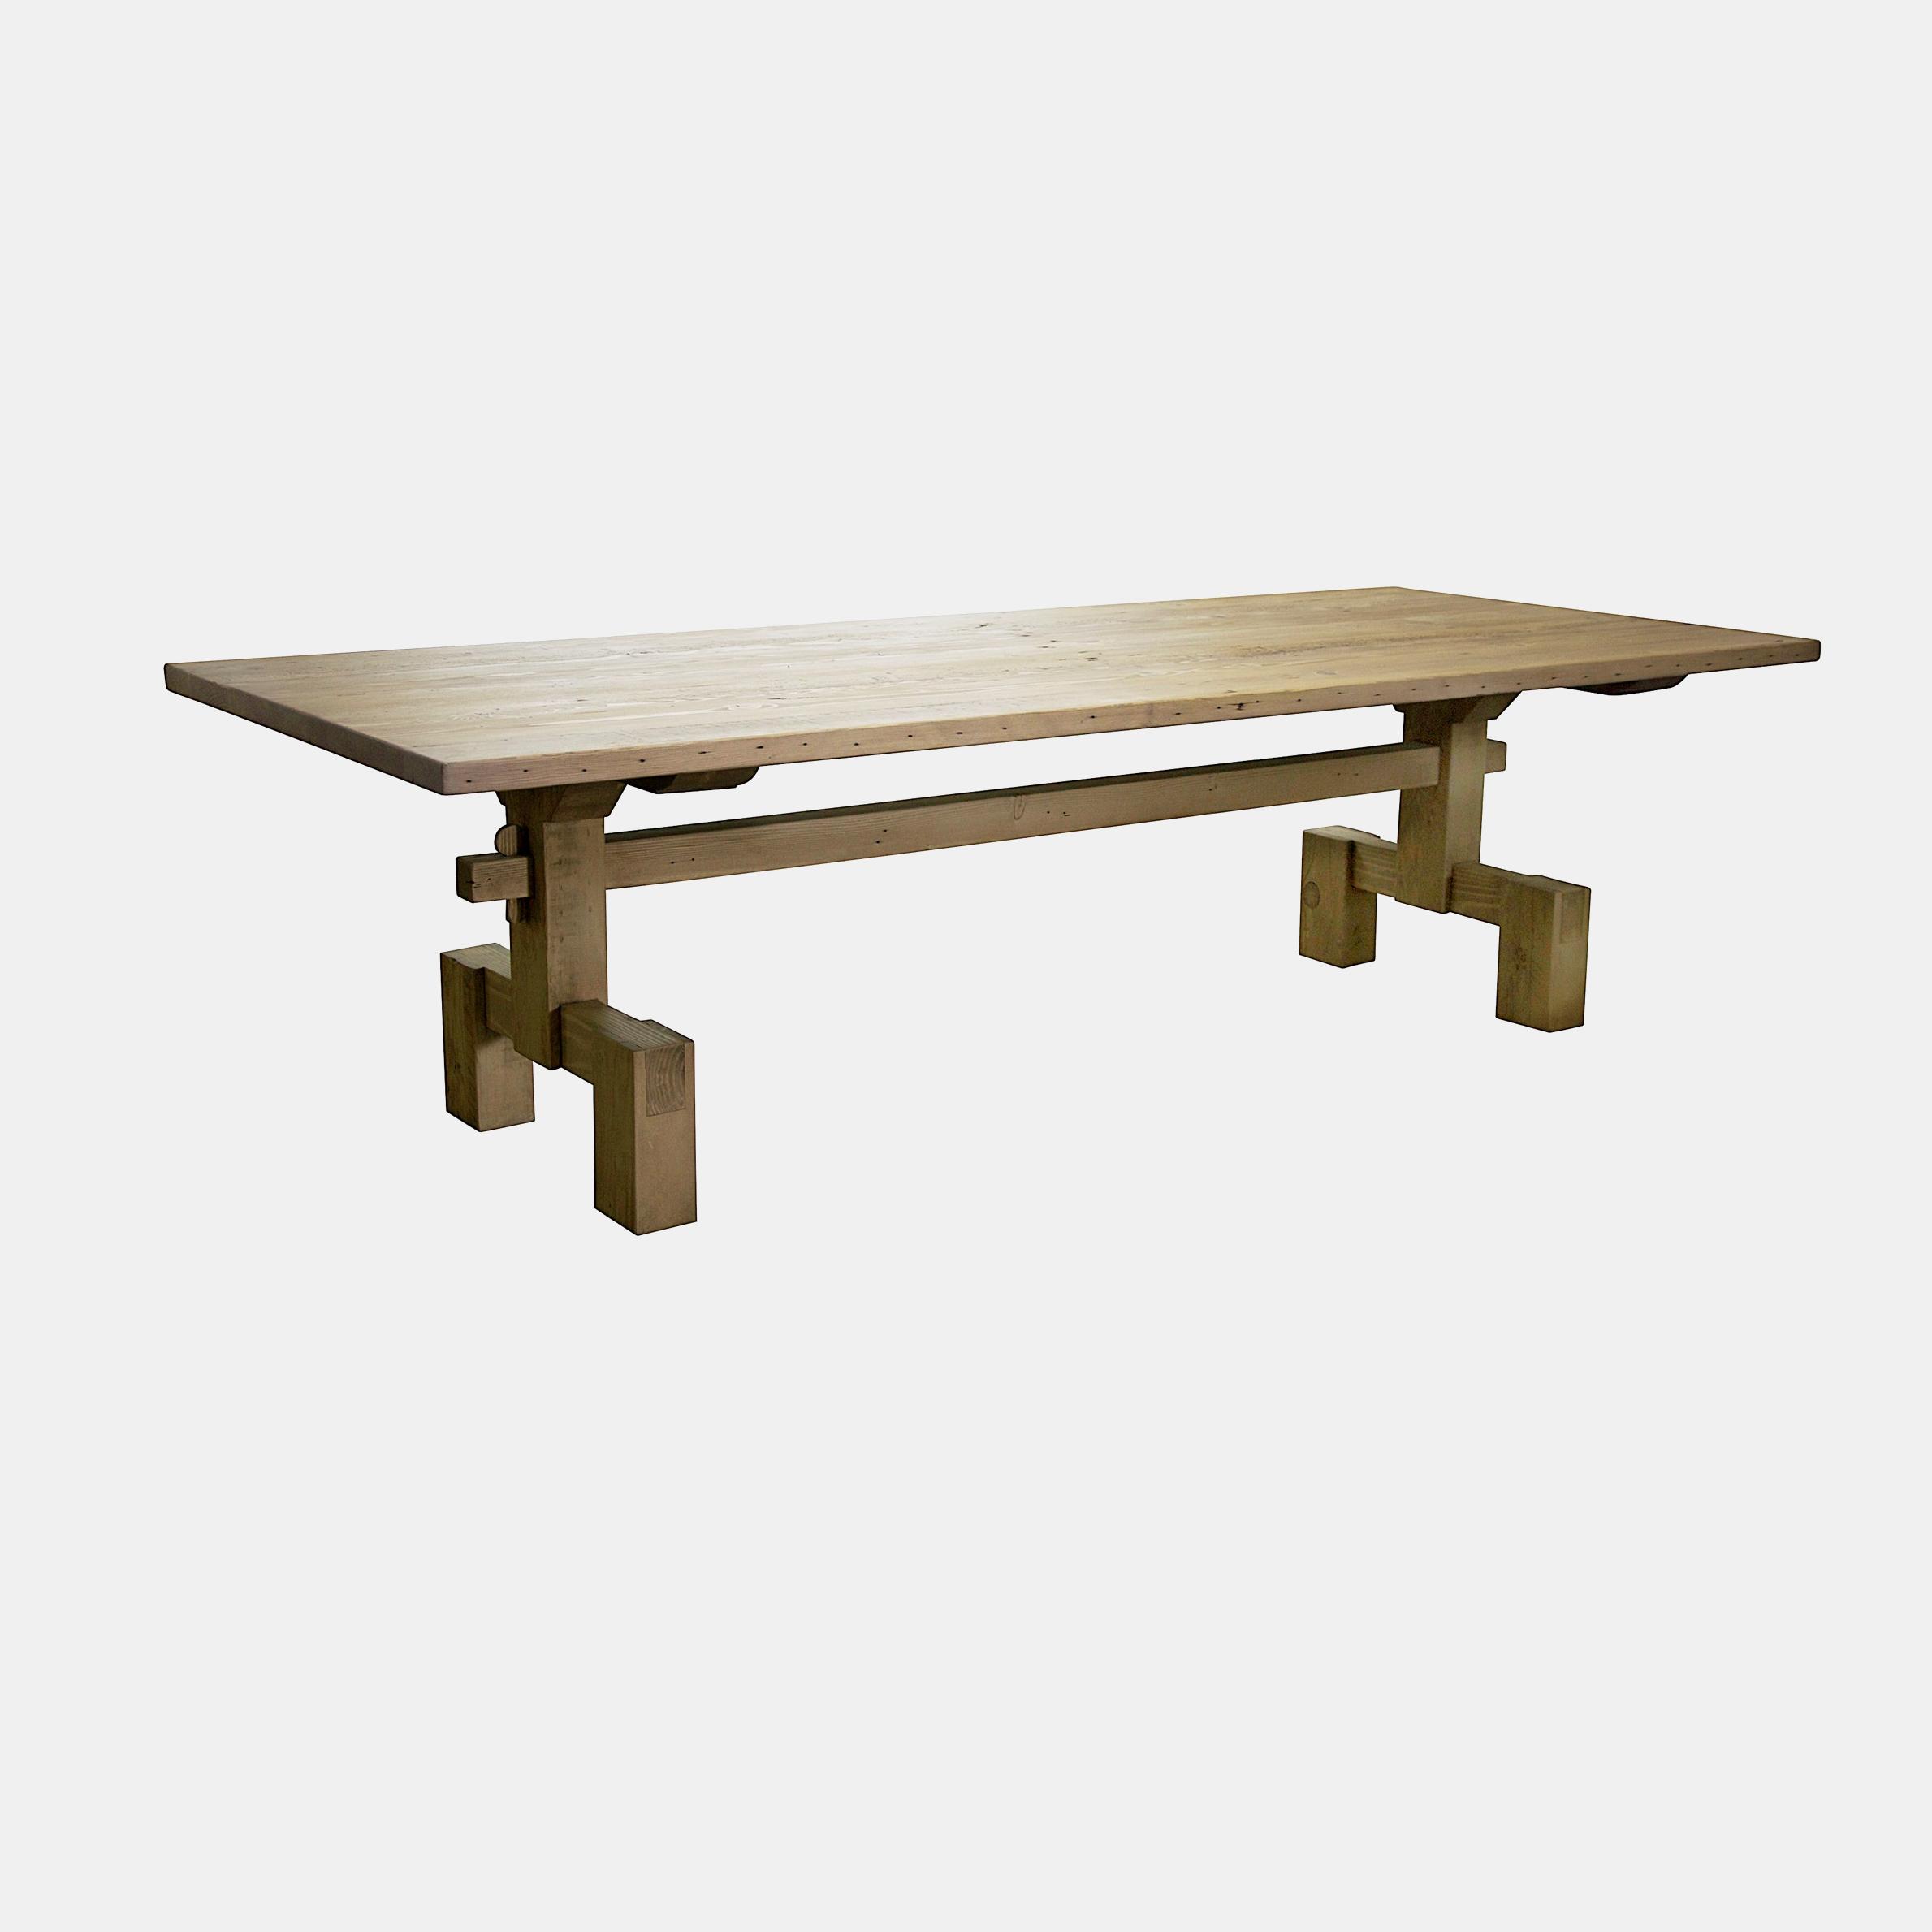 "Emilia Dining Table  96"", 108"" or 120""l x 44""w x 30.5""h SKU00541CFC"